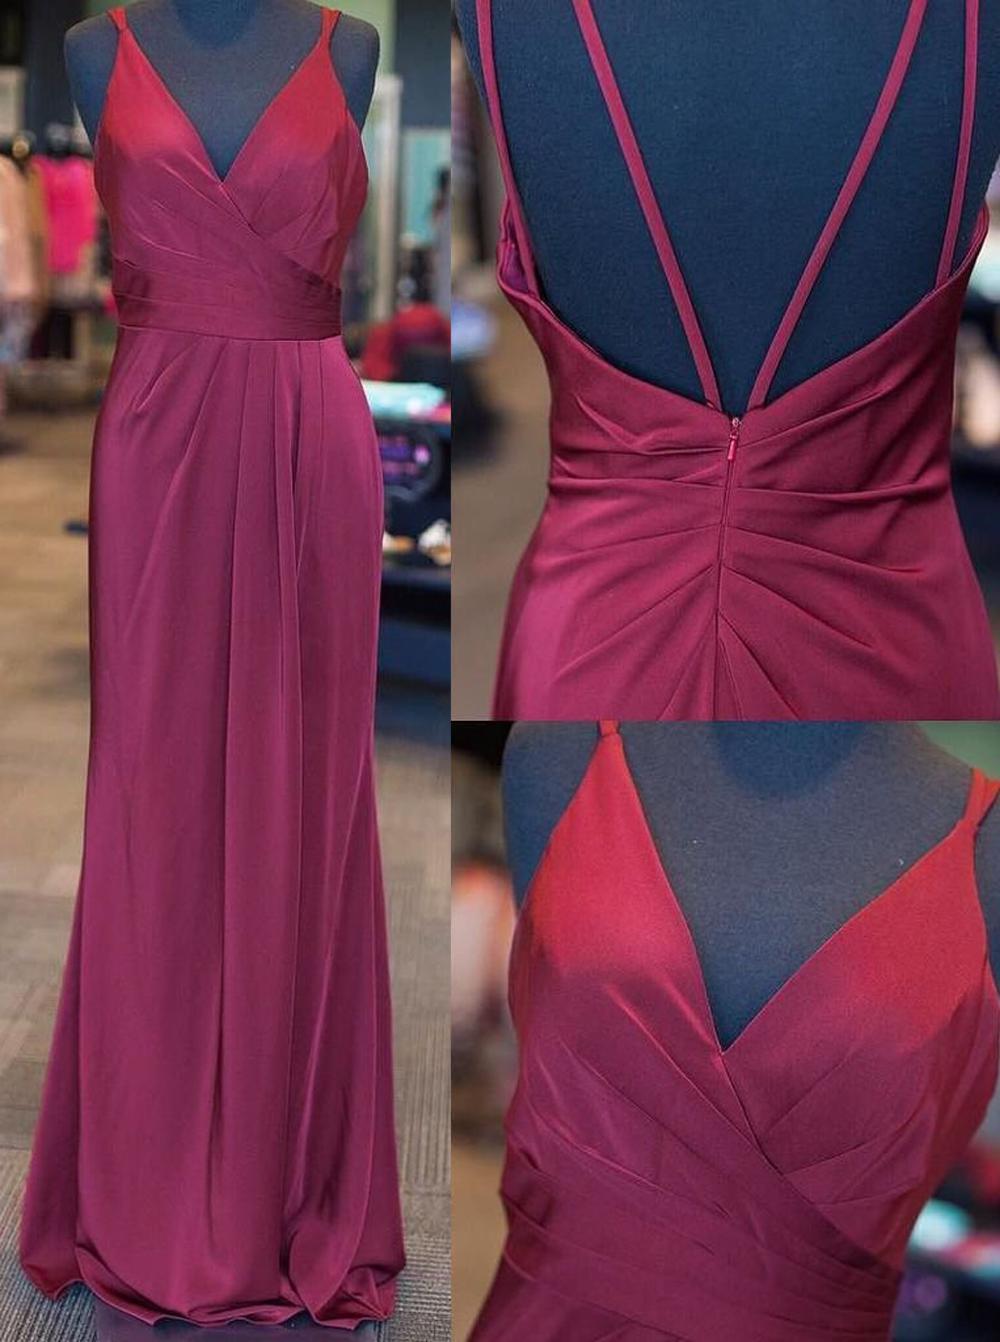 Simple-dress / Elegant V-neck Sleeveless Floor-Length Ruched Lilac Prom Dress Open Back